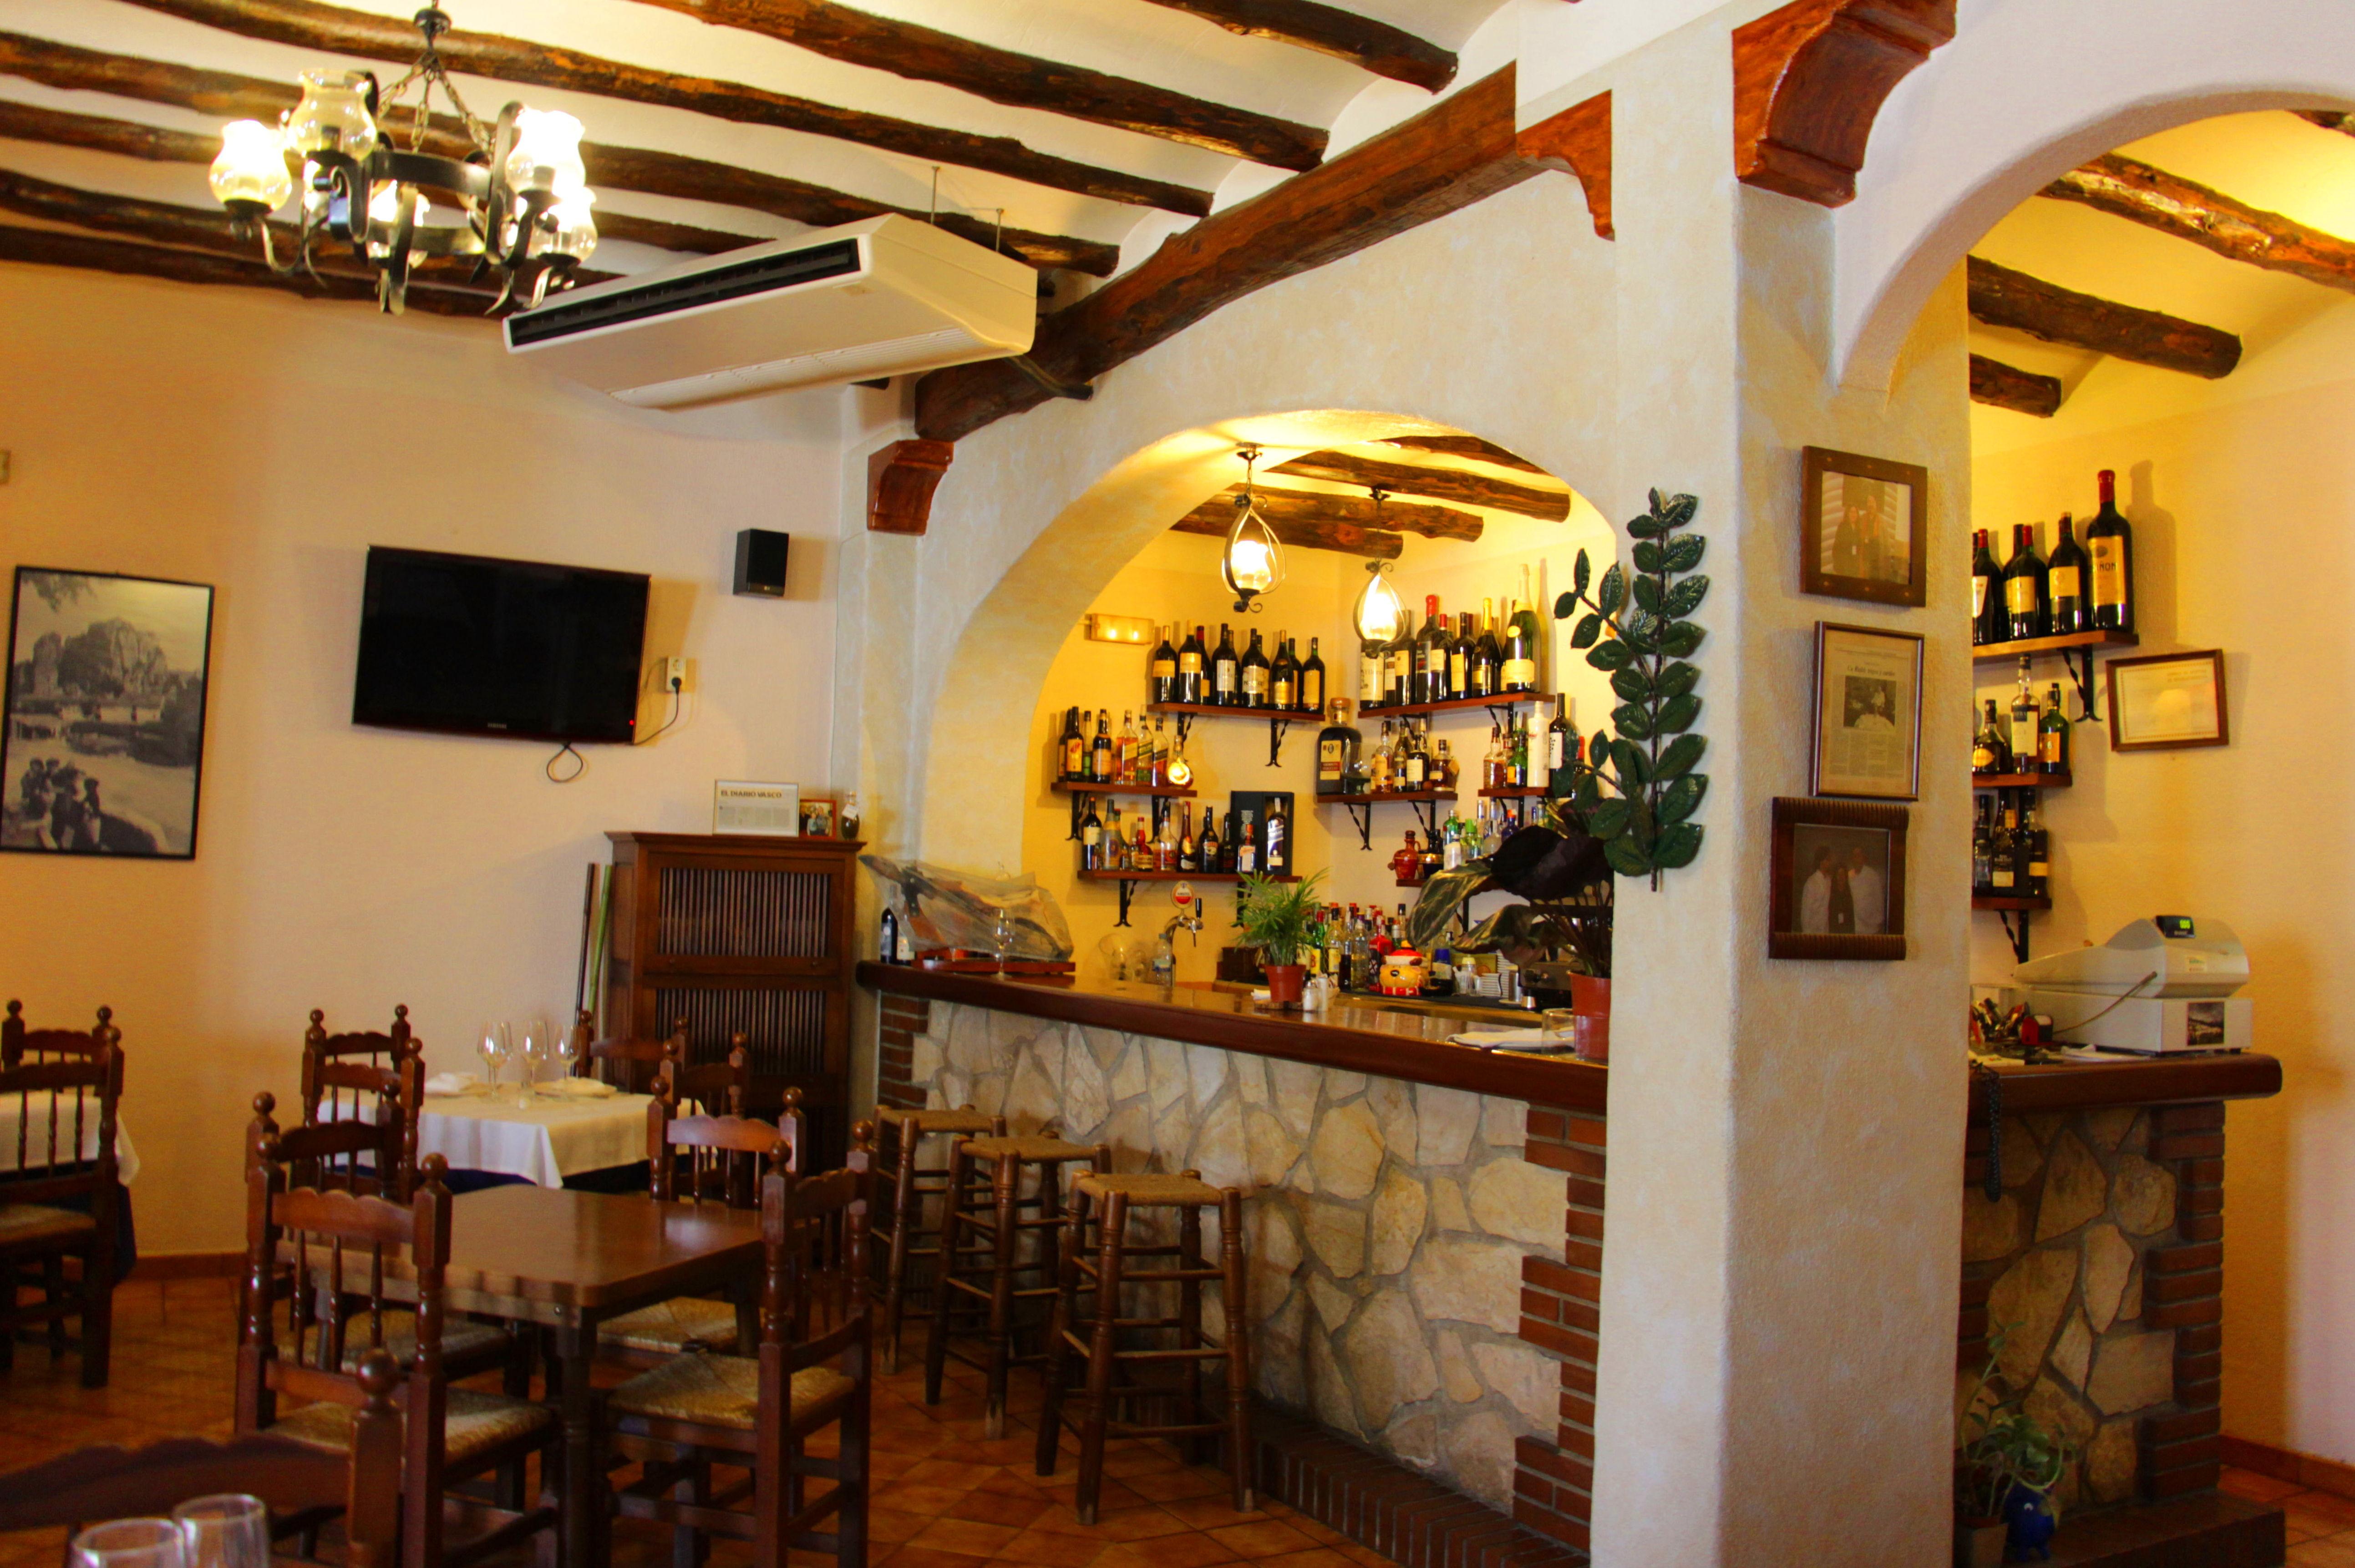 Foto 18 de Mesón - restaurante en Benimantell | Mesón Ca Rafel